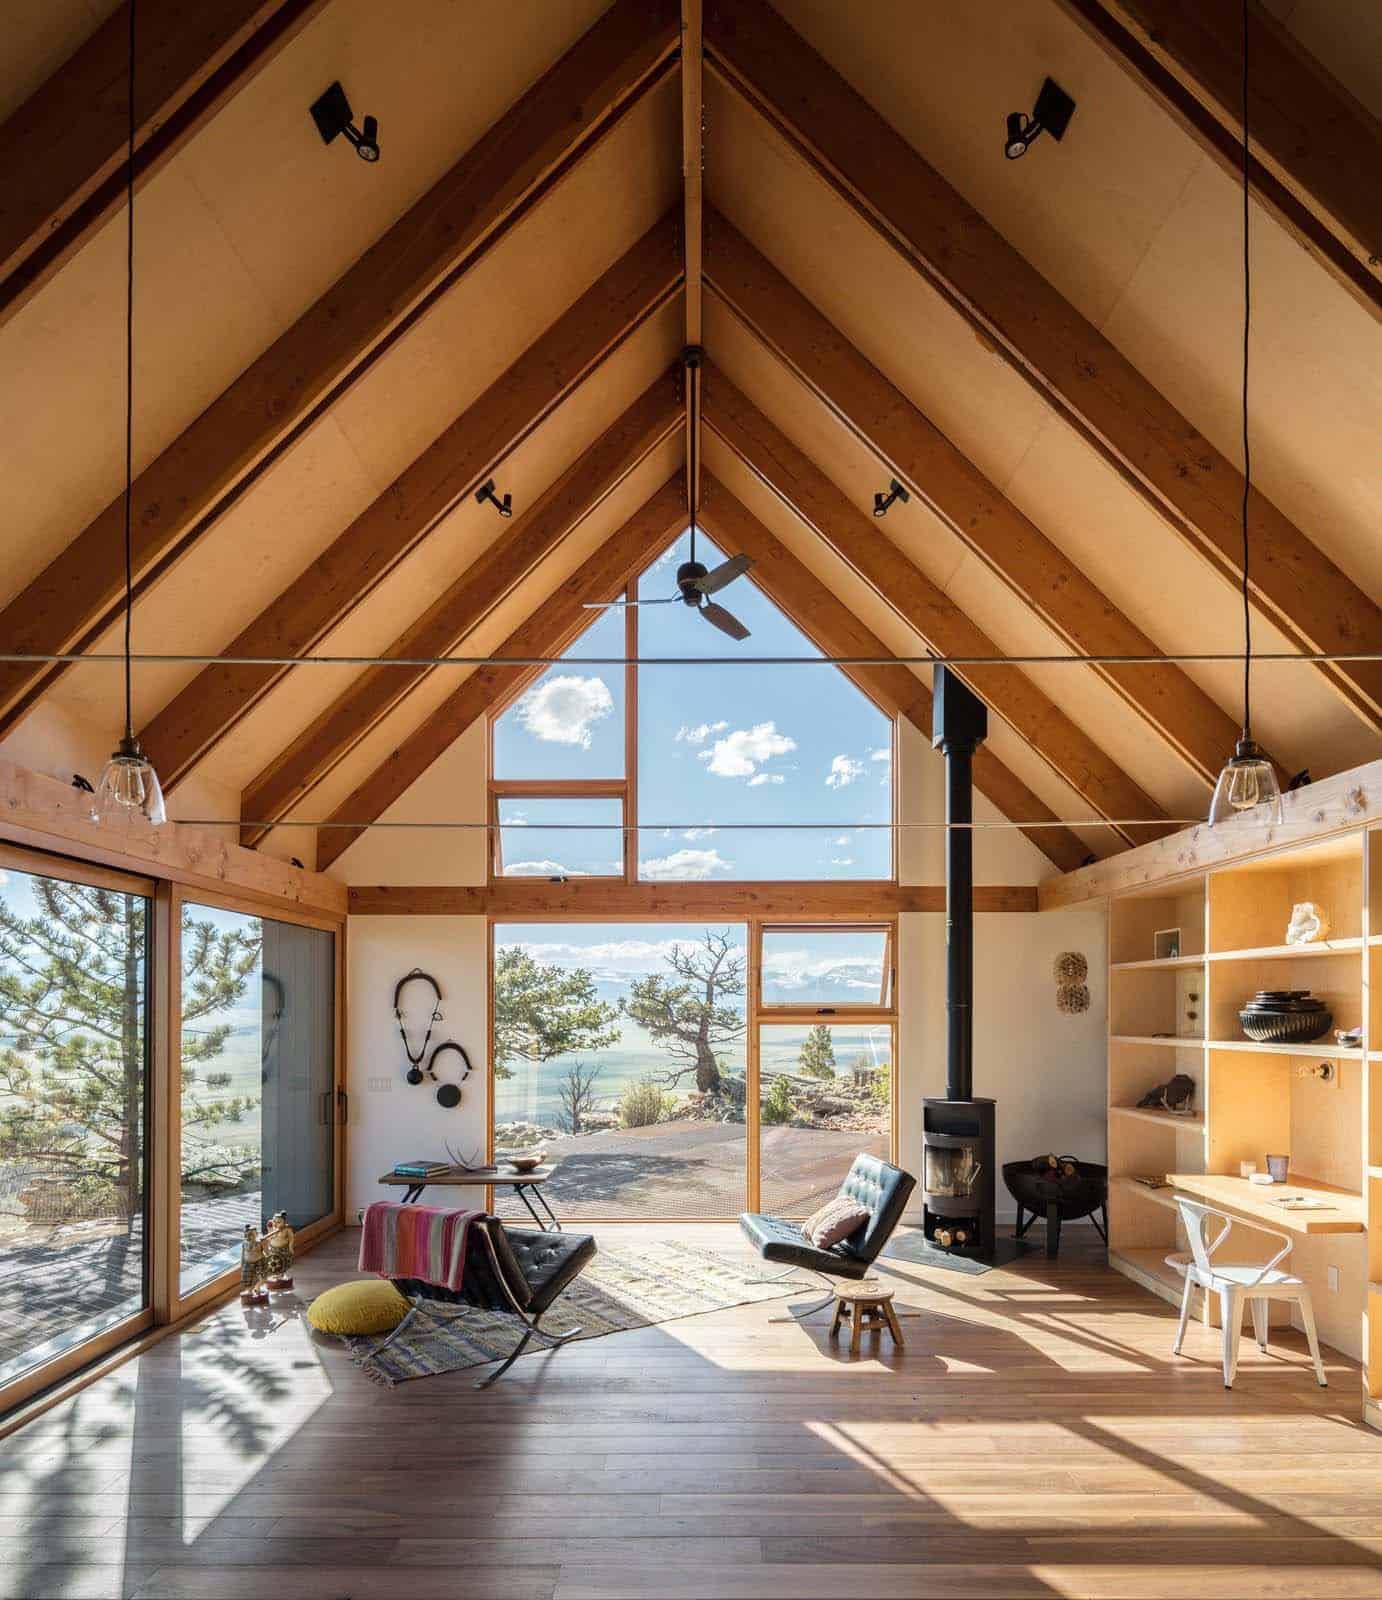 cozy-rustic-cabin-living-room